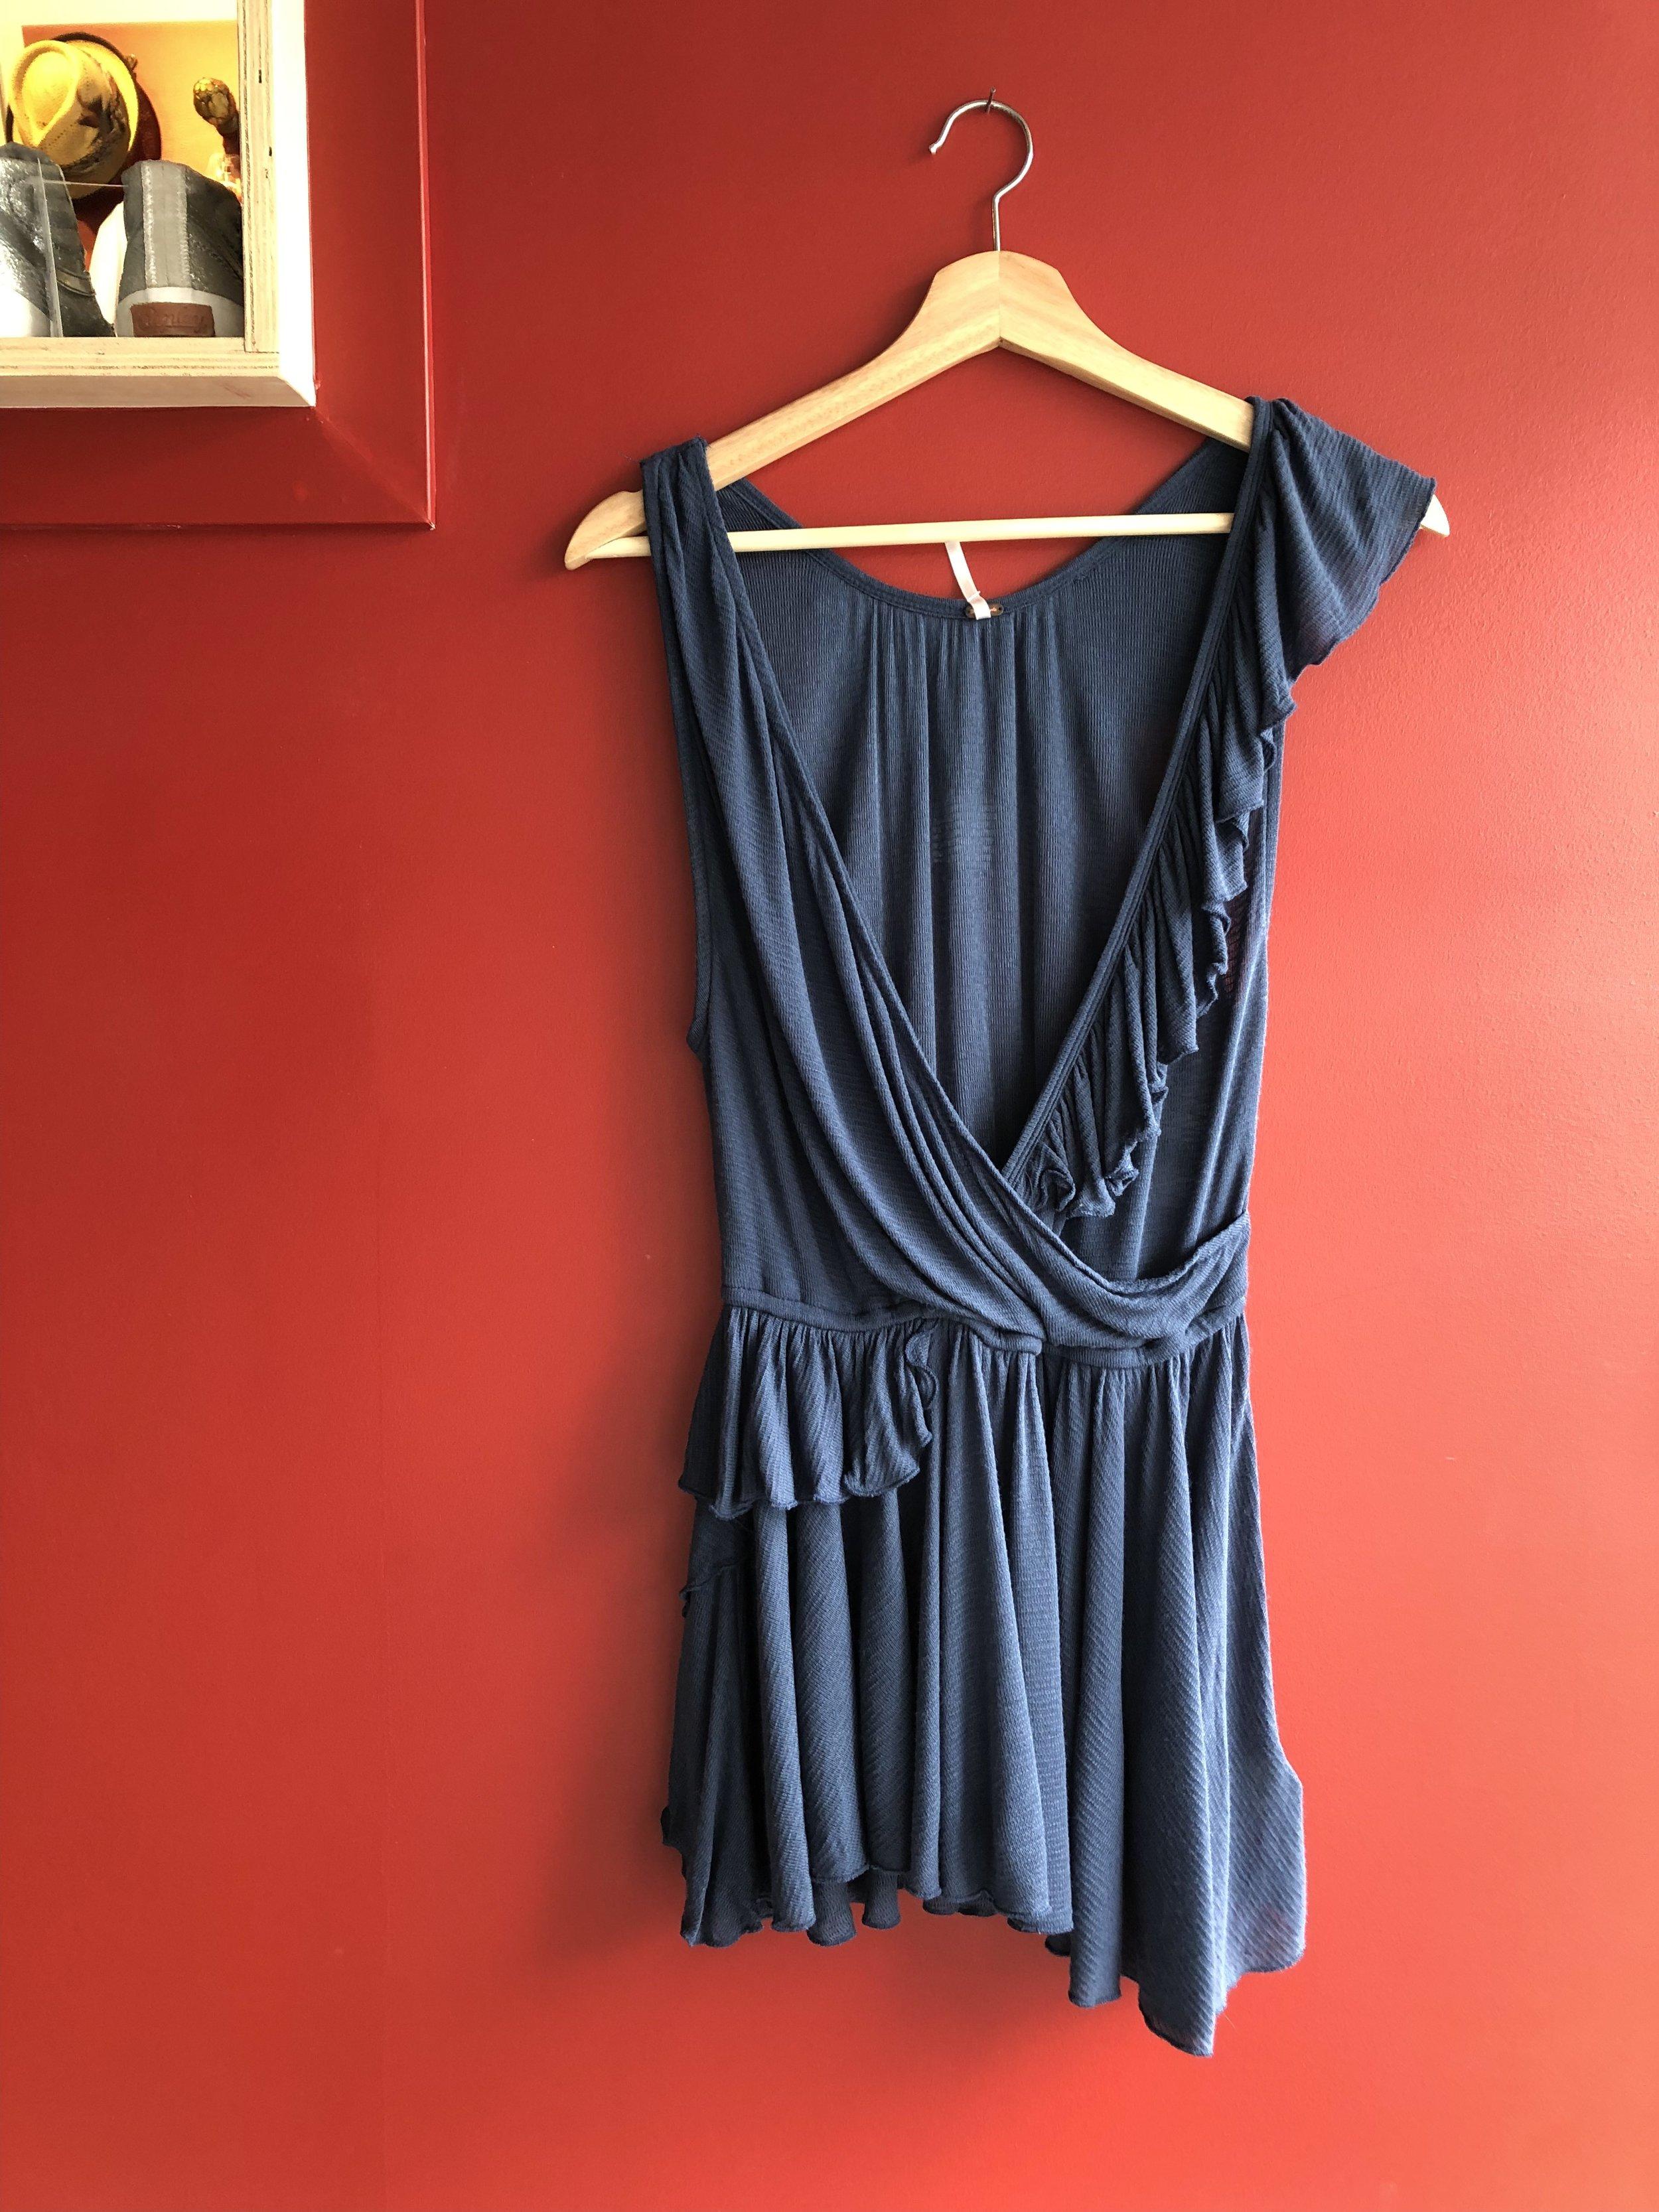 Size M, $32